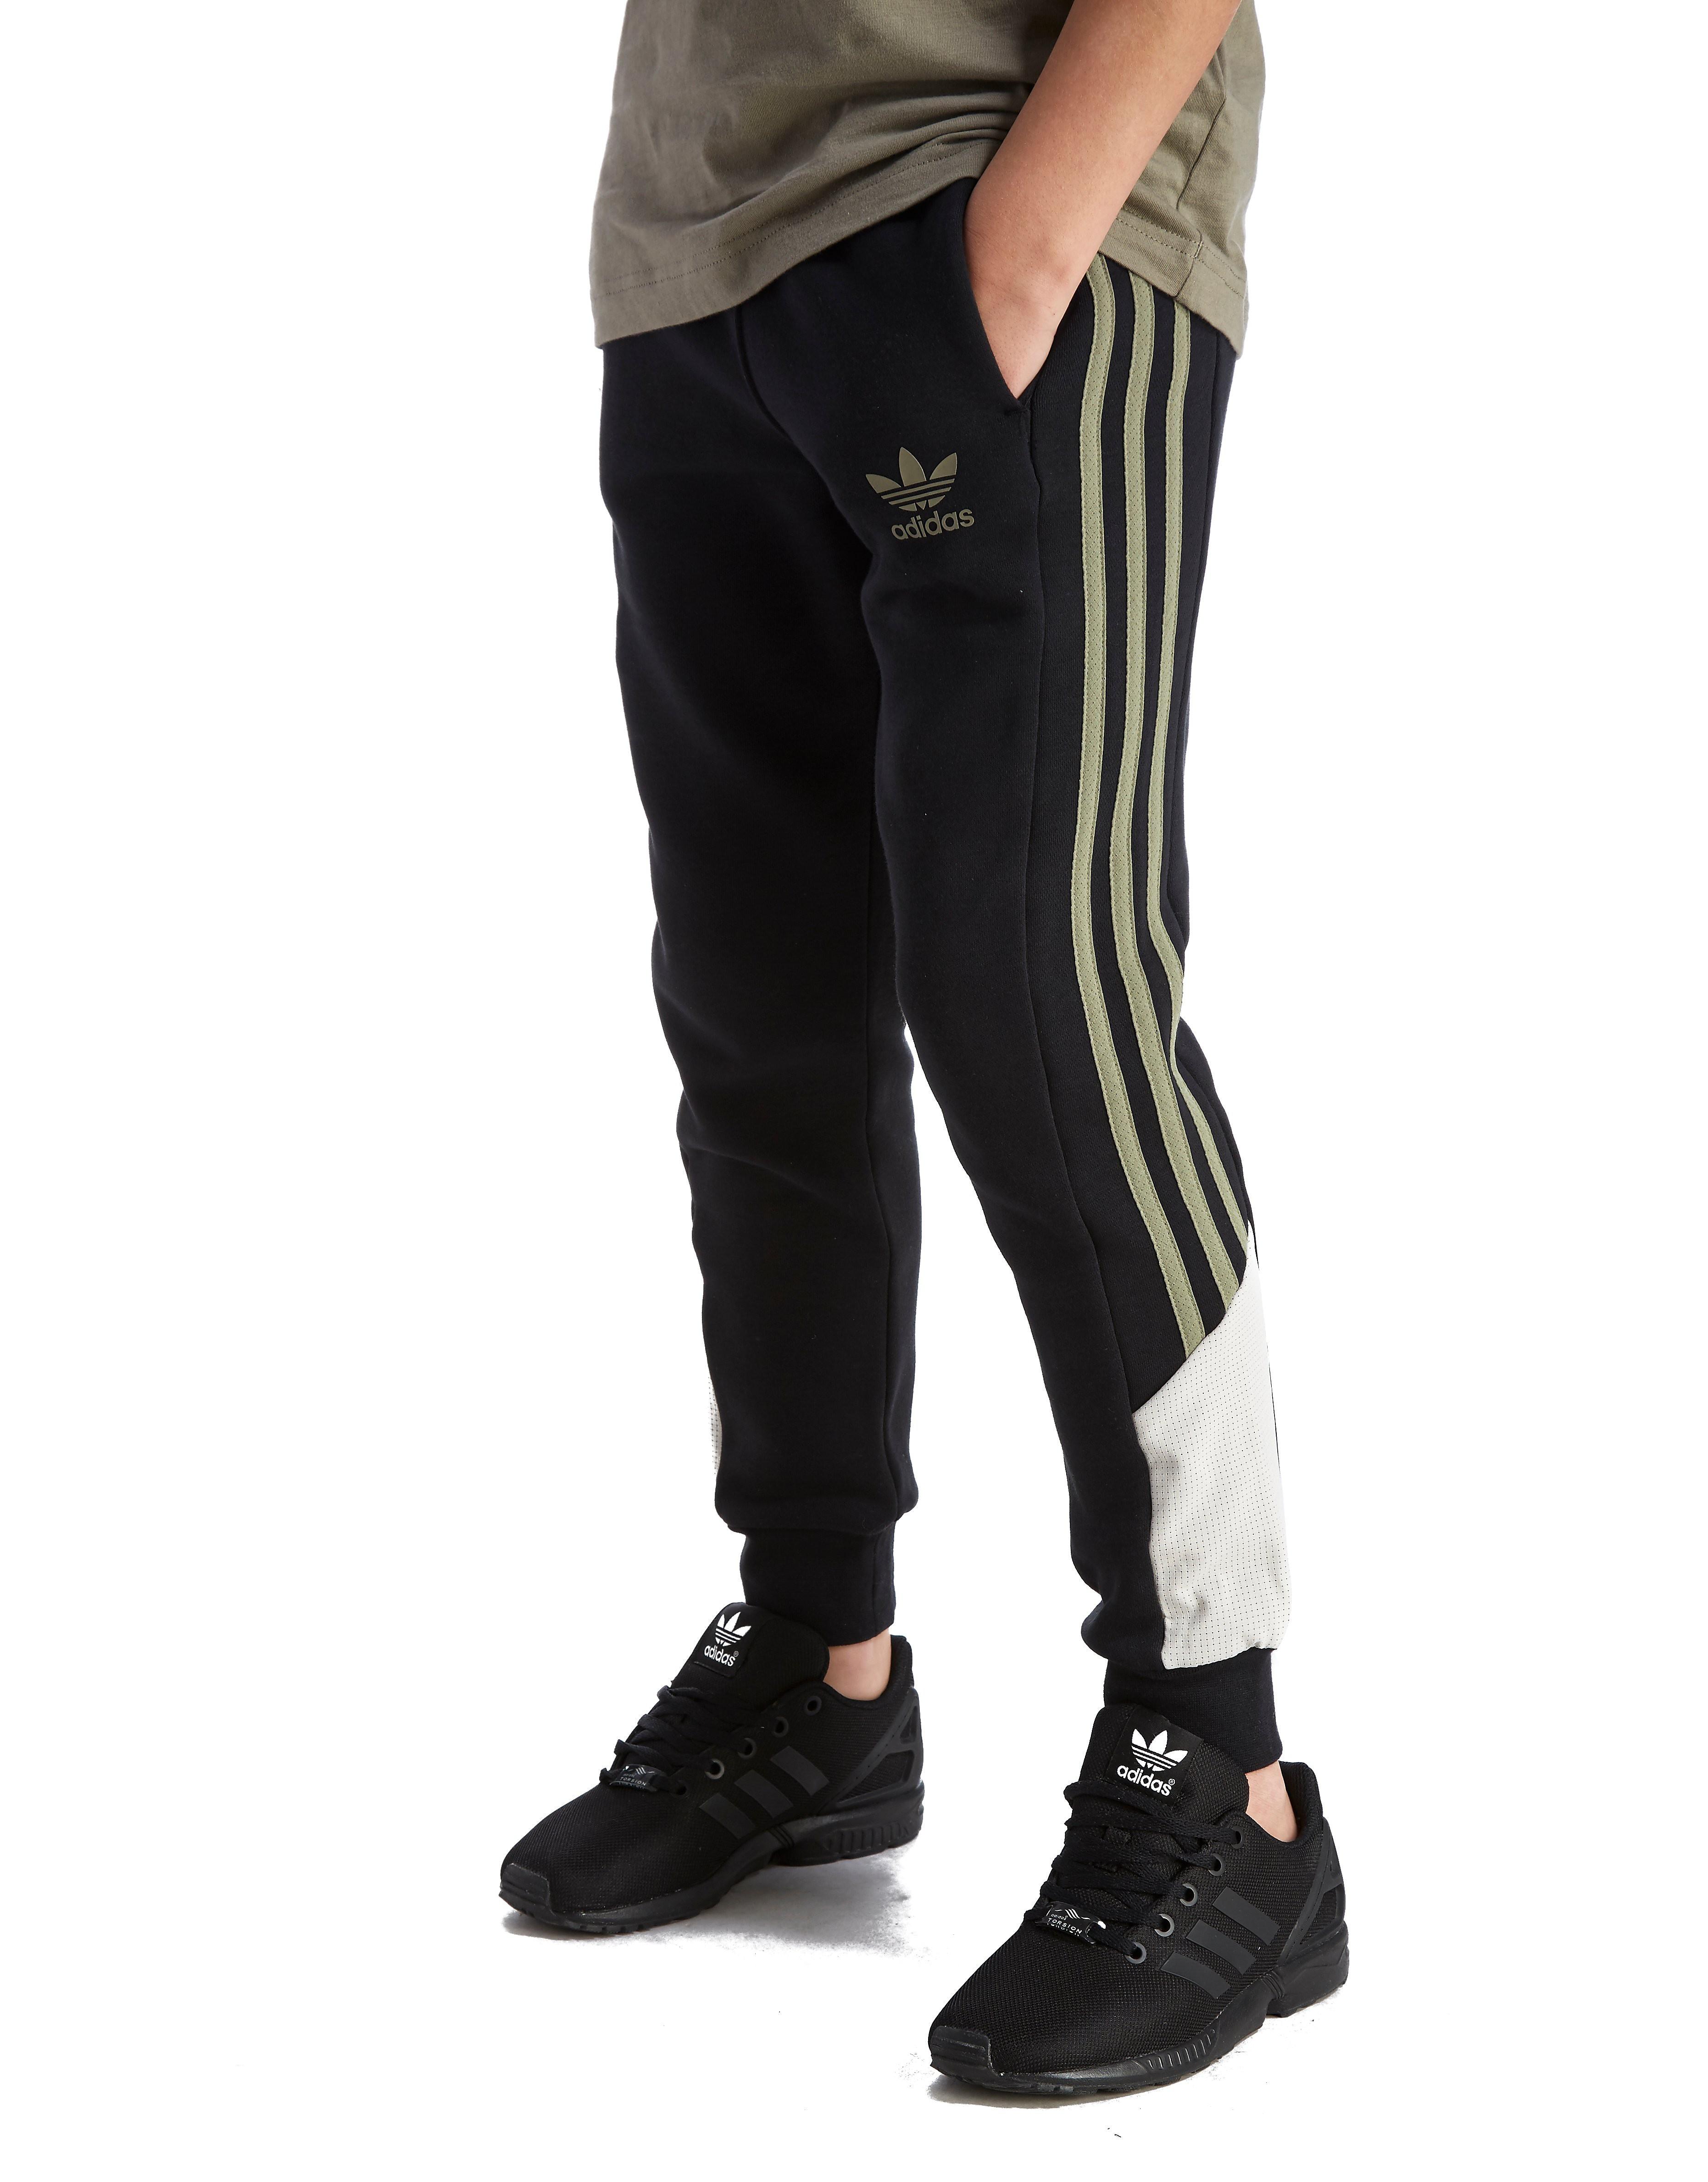 adidas Originals Europe Pants Enfant